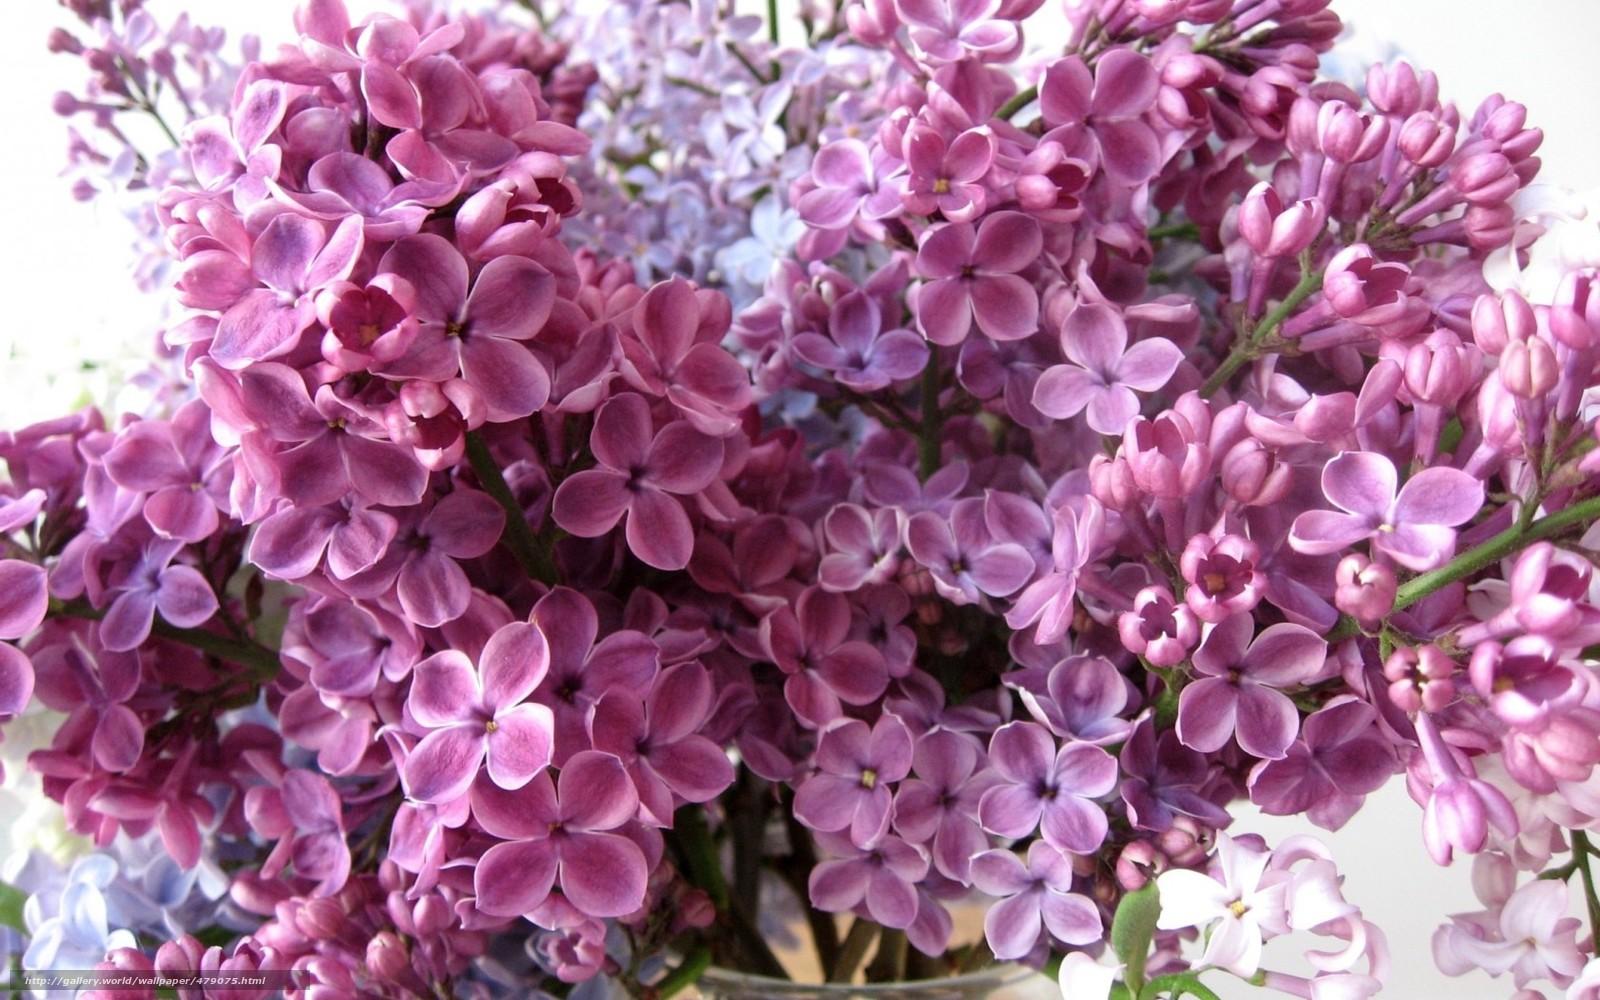 Download wallpaper Petals lilac Flowers desktop wallpaper in 1600x1000